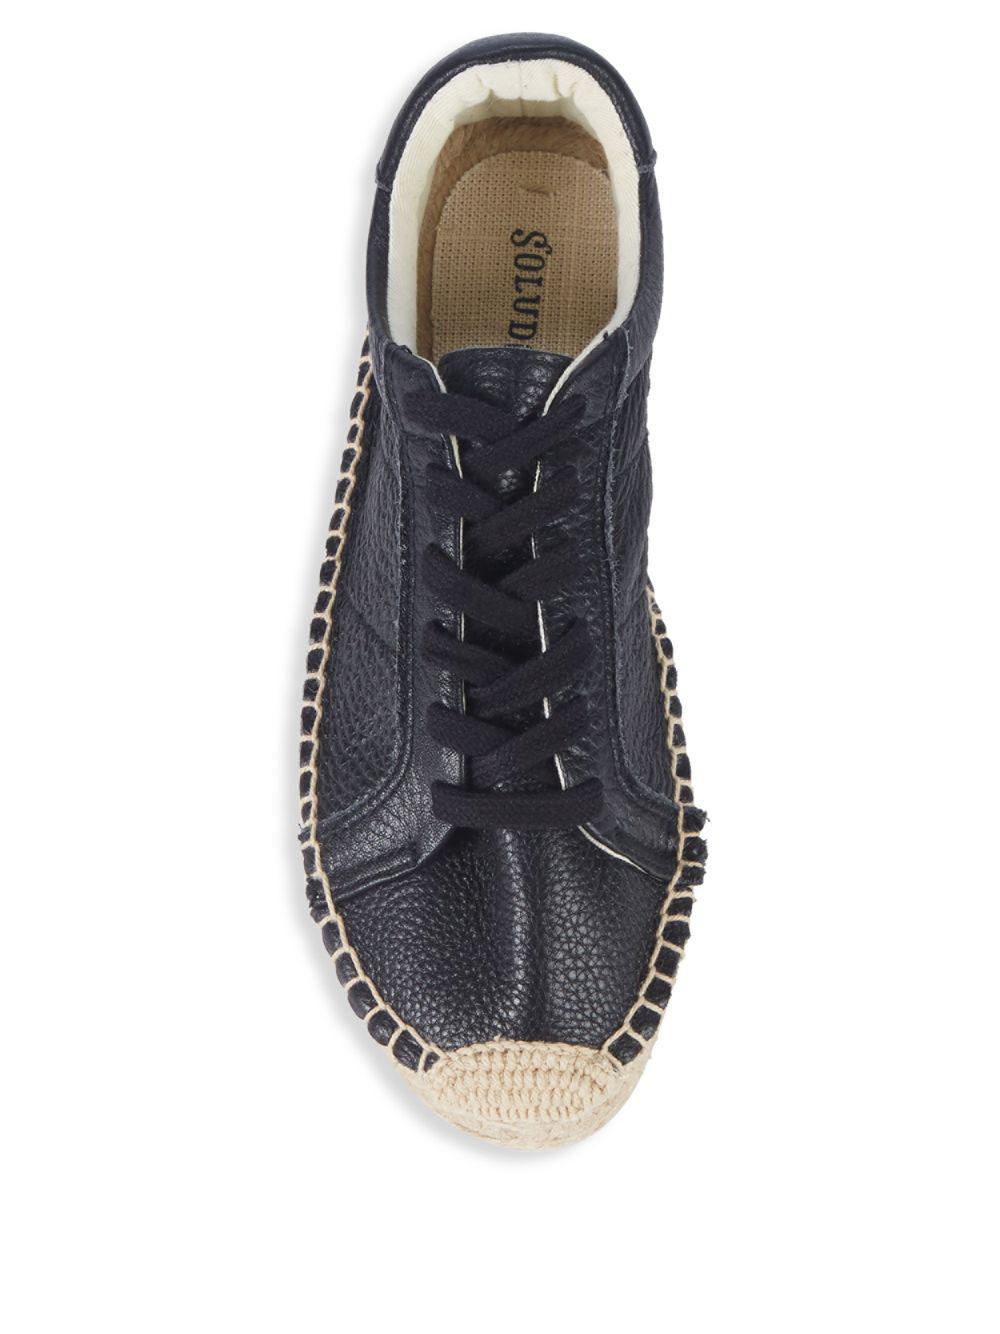 Soludos Leather Platform Tennis Espadrille Sneakers in Black